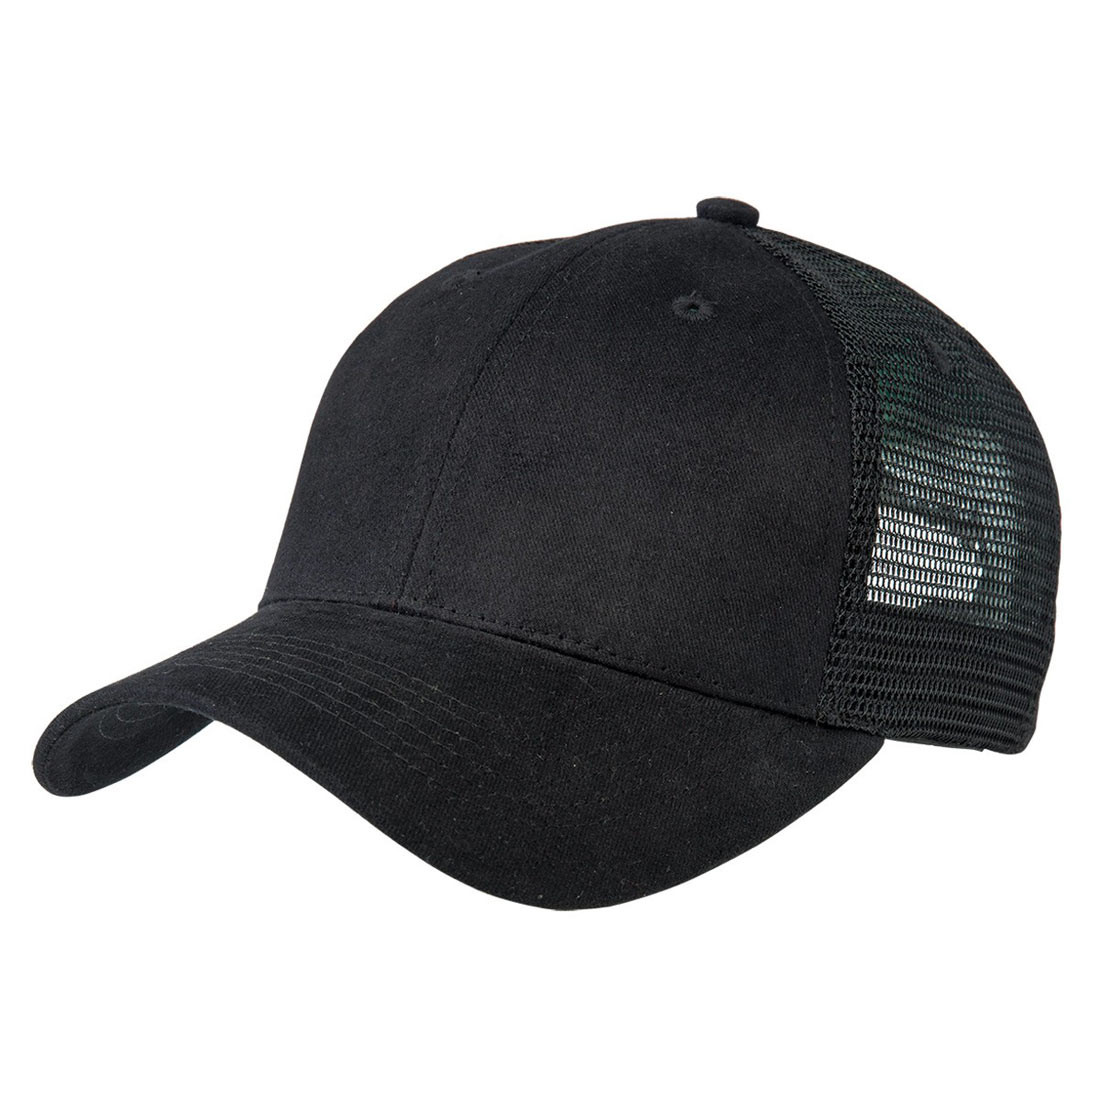 Premium Plain Trucker Hats Wholesale Online Unisex Caps 1bab05011aa